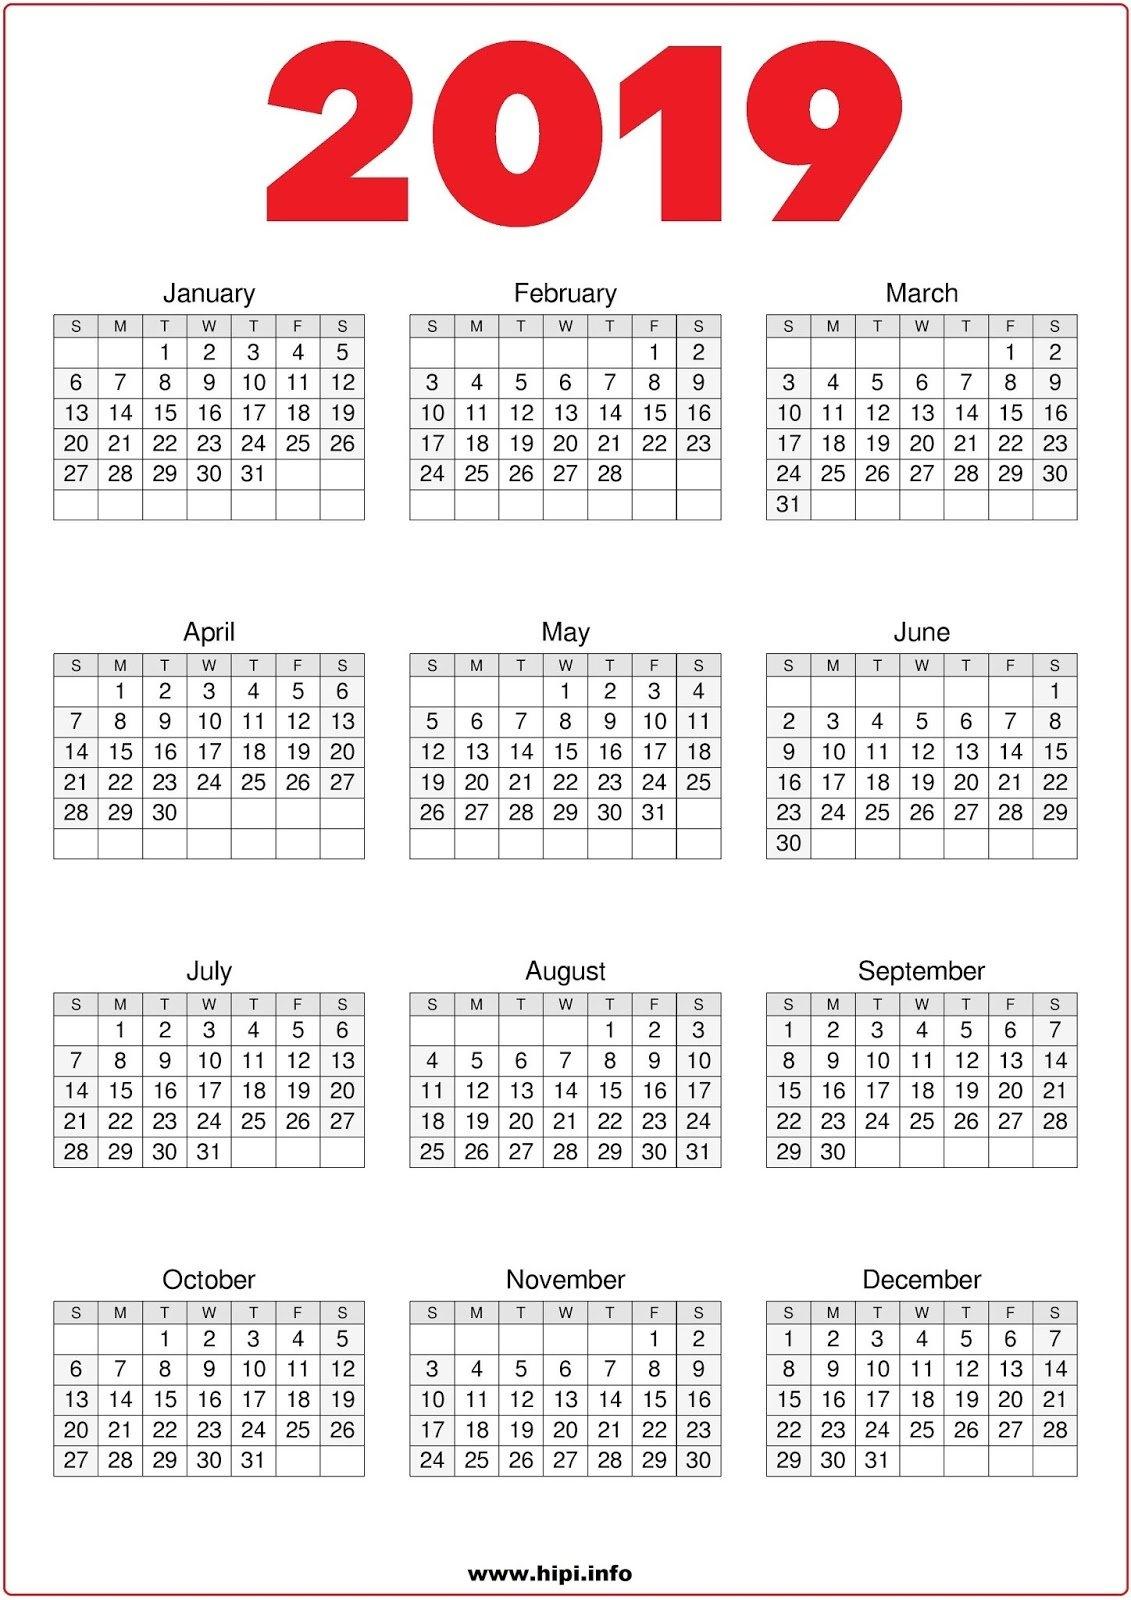 Twitter Headers / Facebook Covers / Wallpapers / Calendars: 2019 007 Calendar 2019